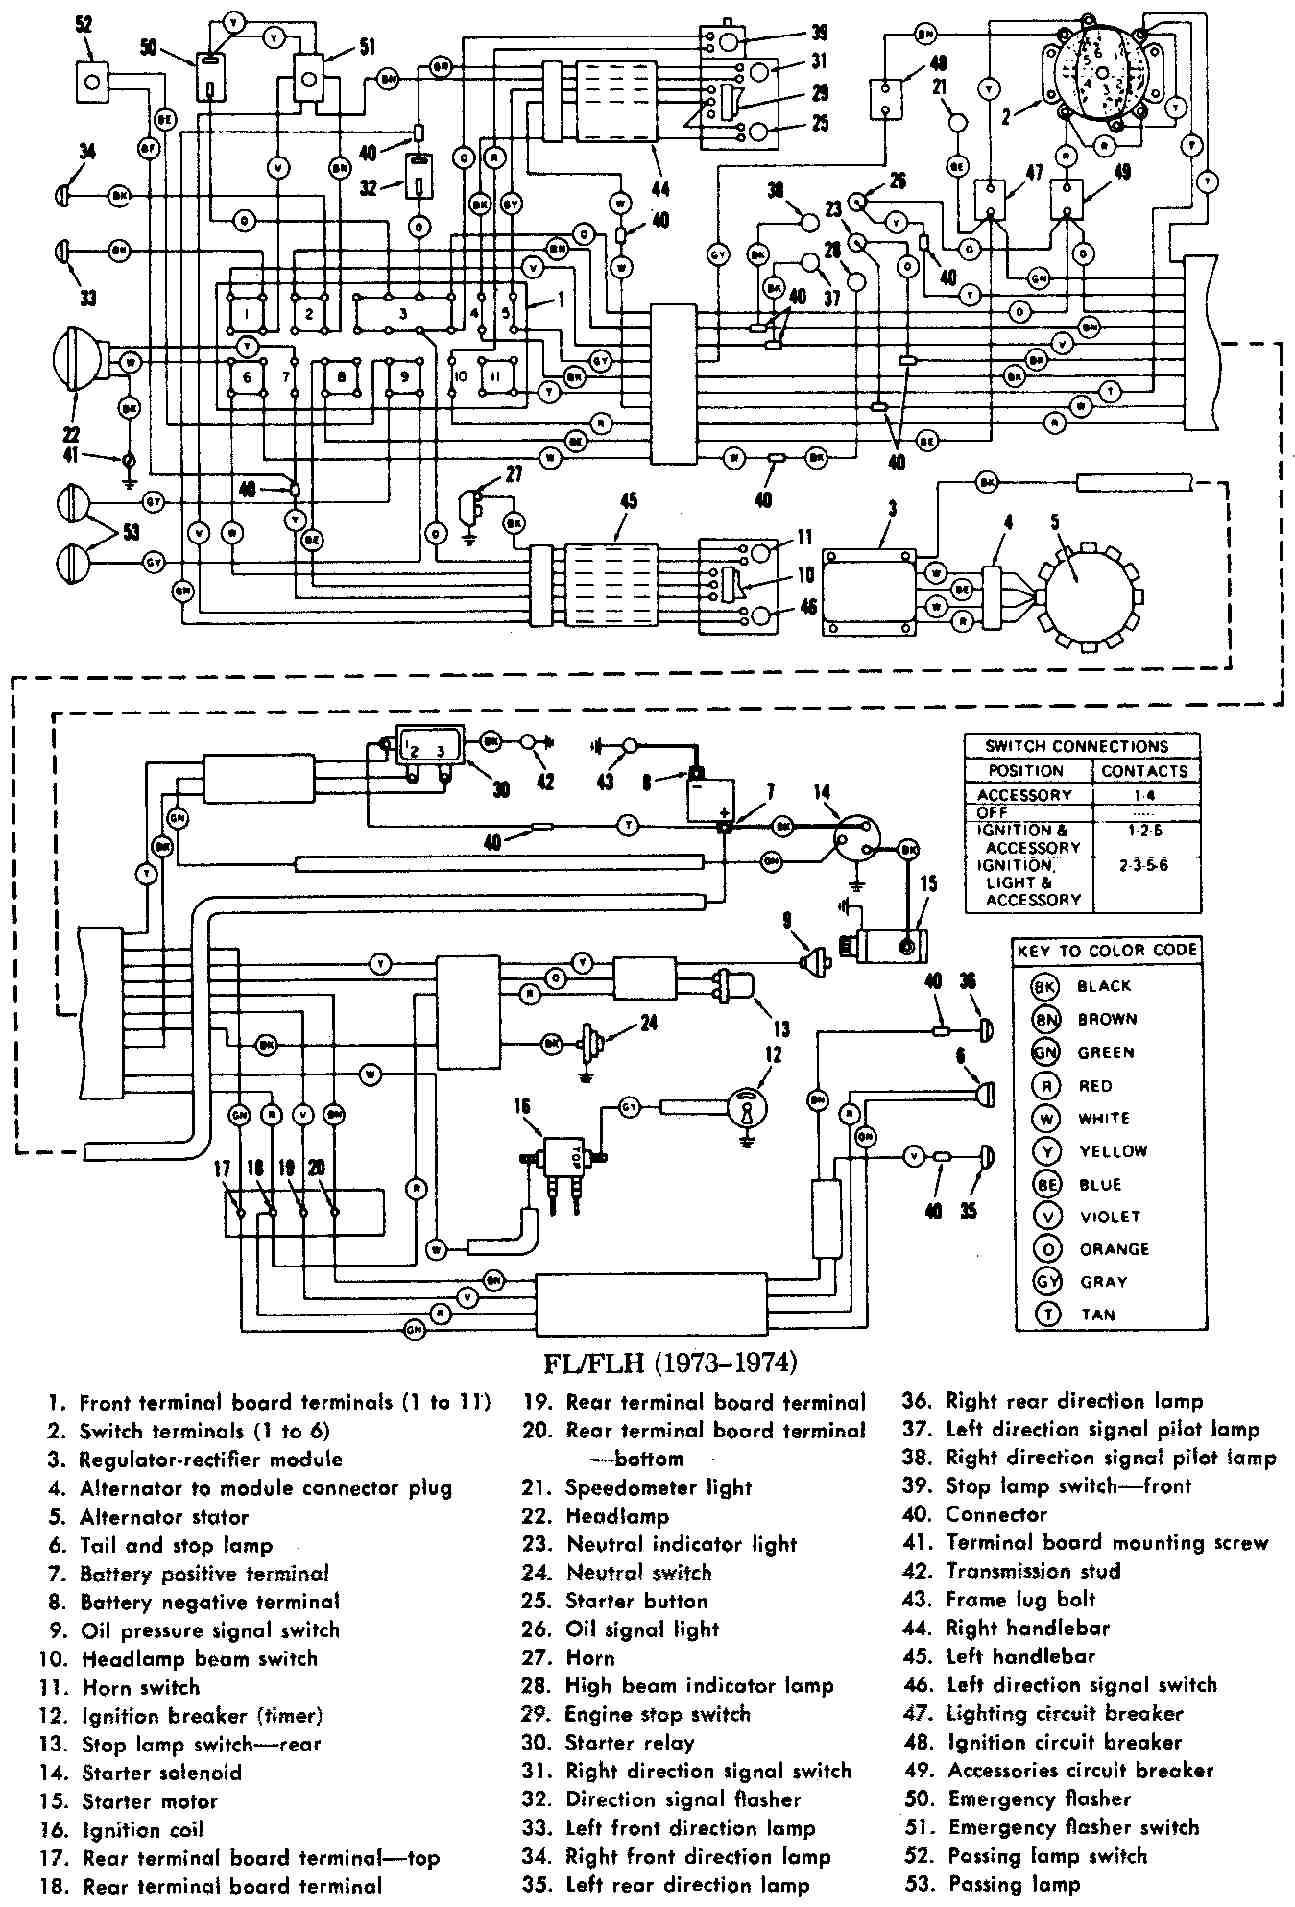 Shovel Head Harley Engine Diagram Harley Davidson Wire Diagram 84 Wiring Diagram Datawiring Of Shovel Head Harley Engine Diagram